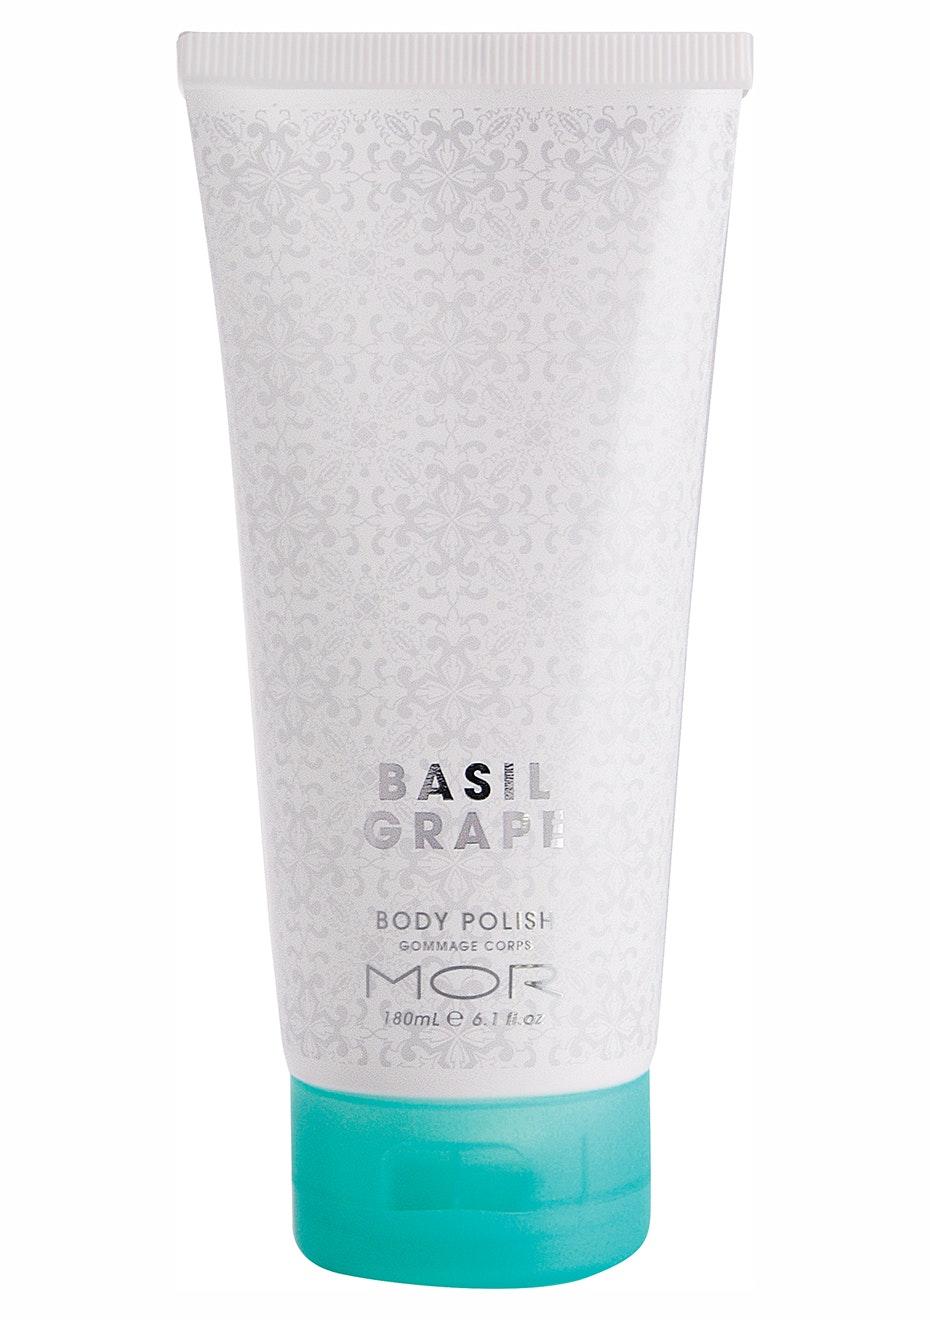 MOR - Body Polish 180ml Basil Grape